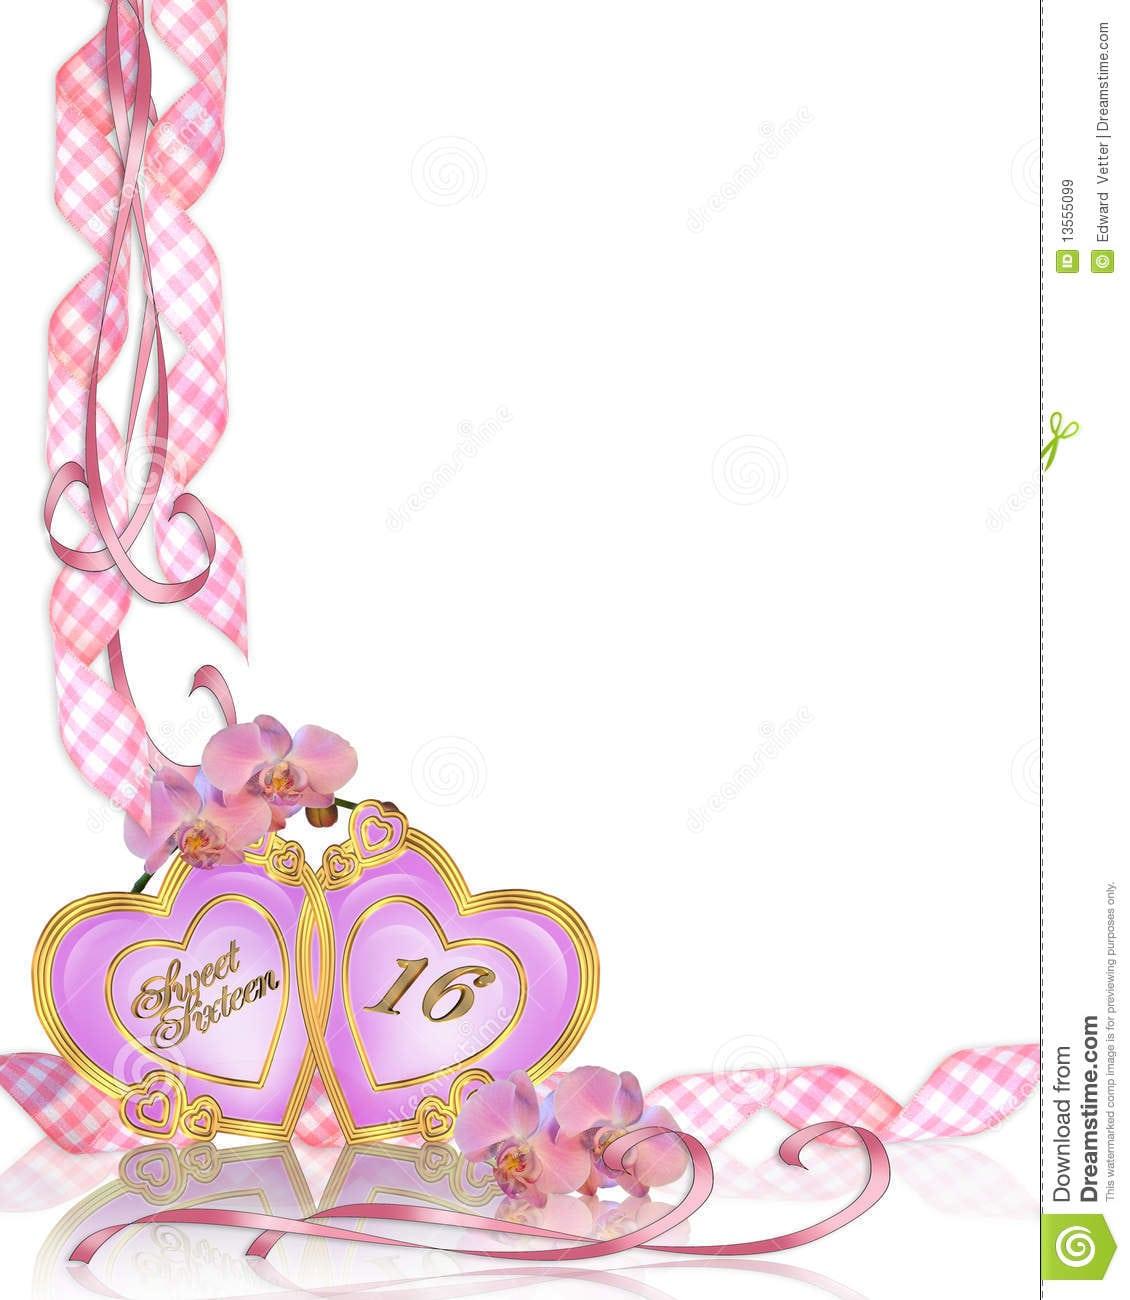 Sweet 16 Birthday Invitation Border Royalty Free Stock Images